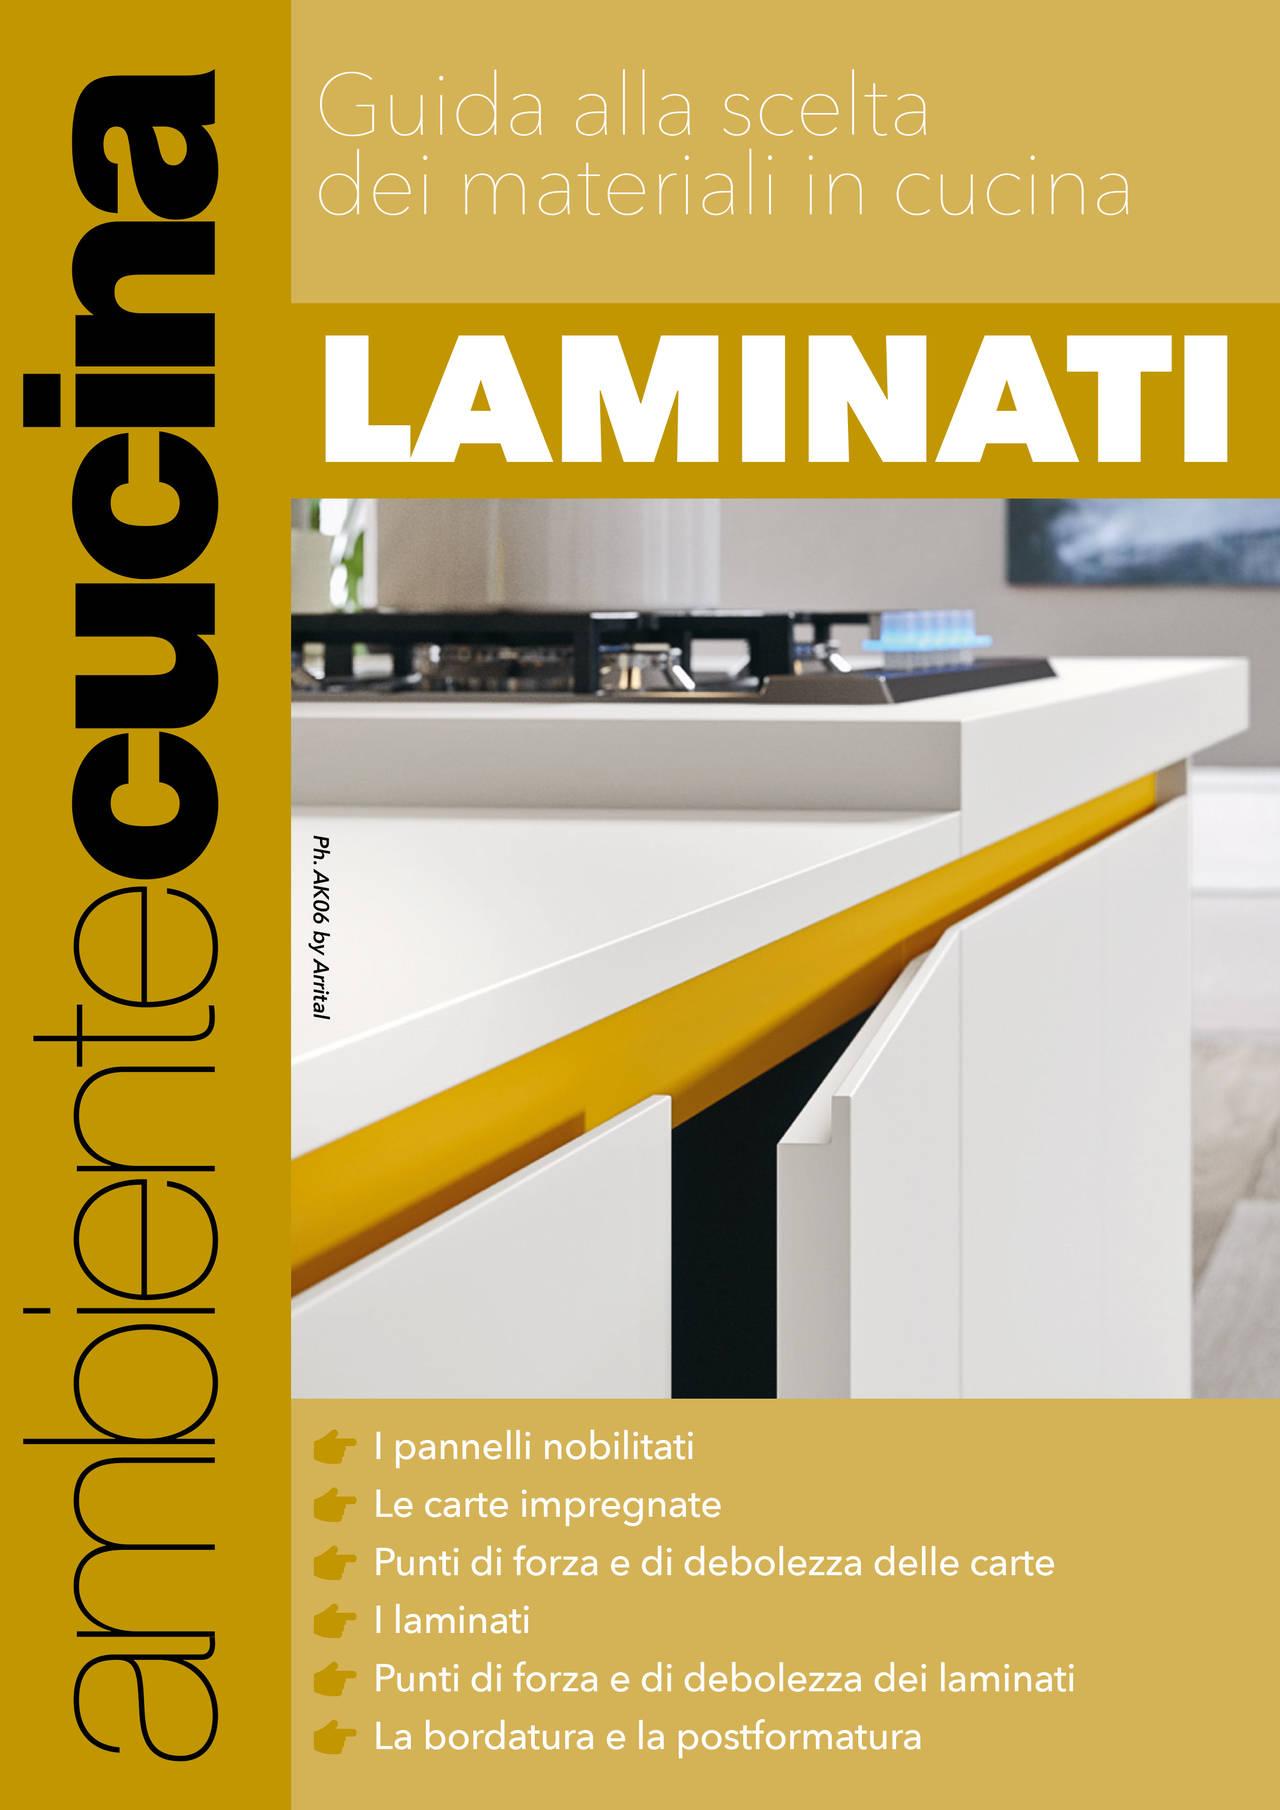 Guida alla scelta dei materiali laminati ambiente cucina - Laminati per cucina ...